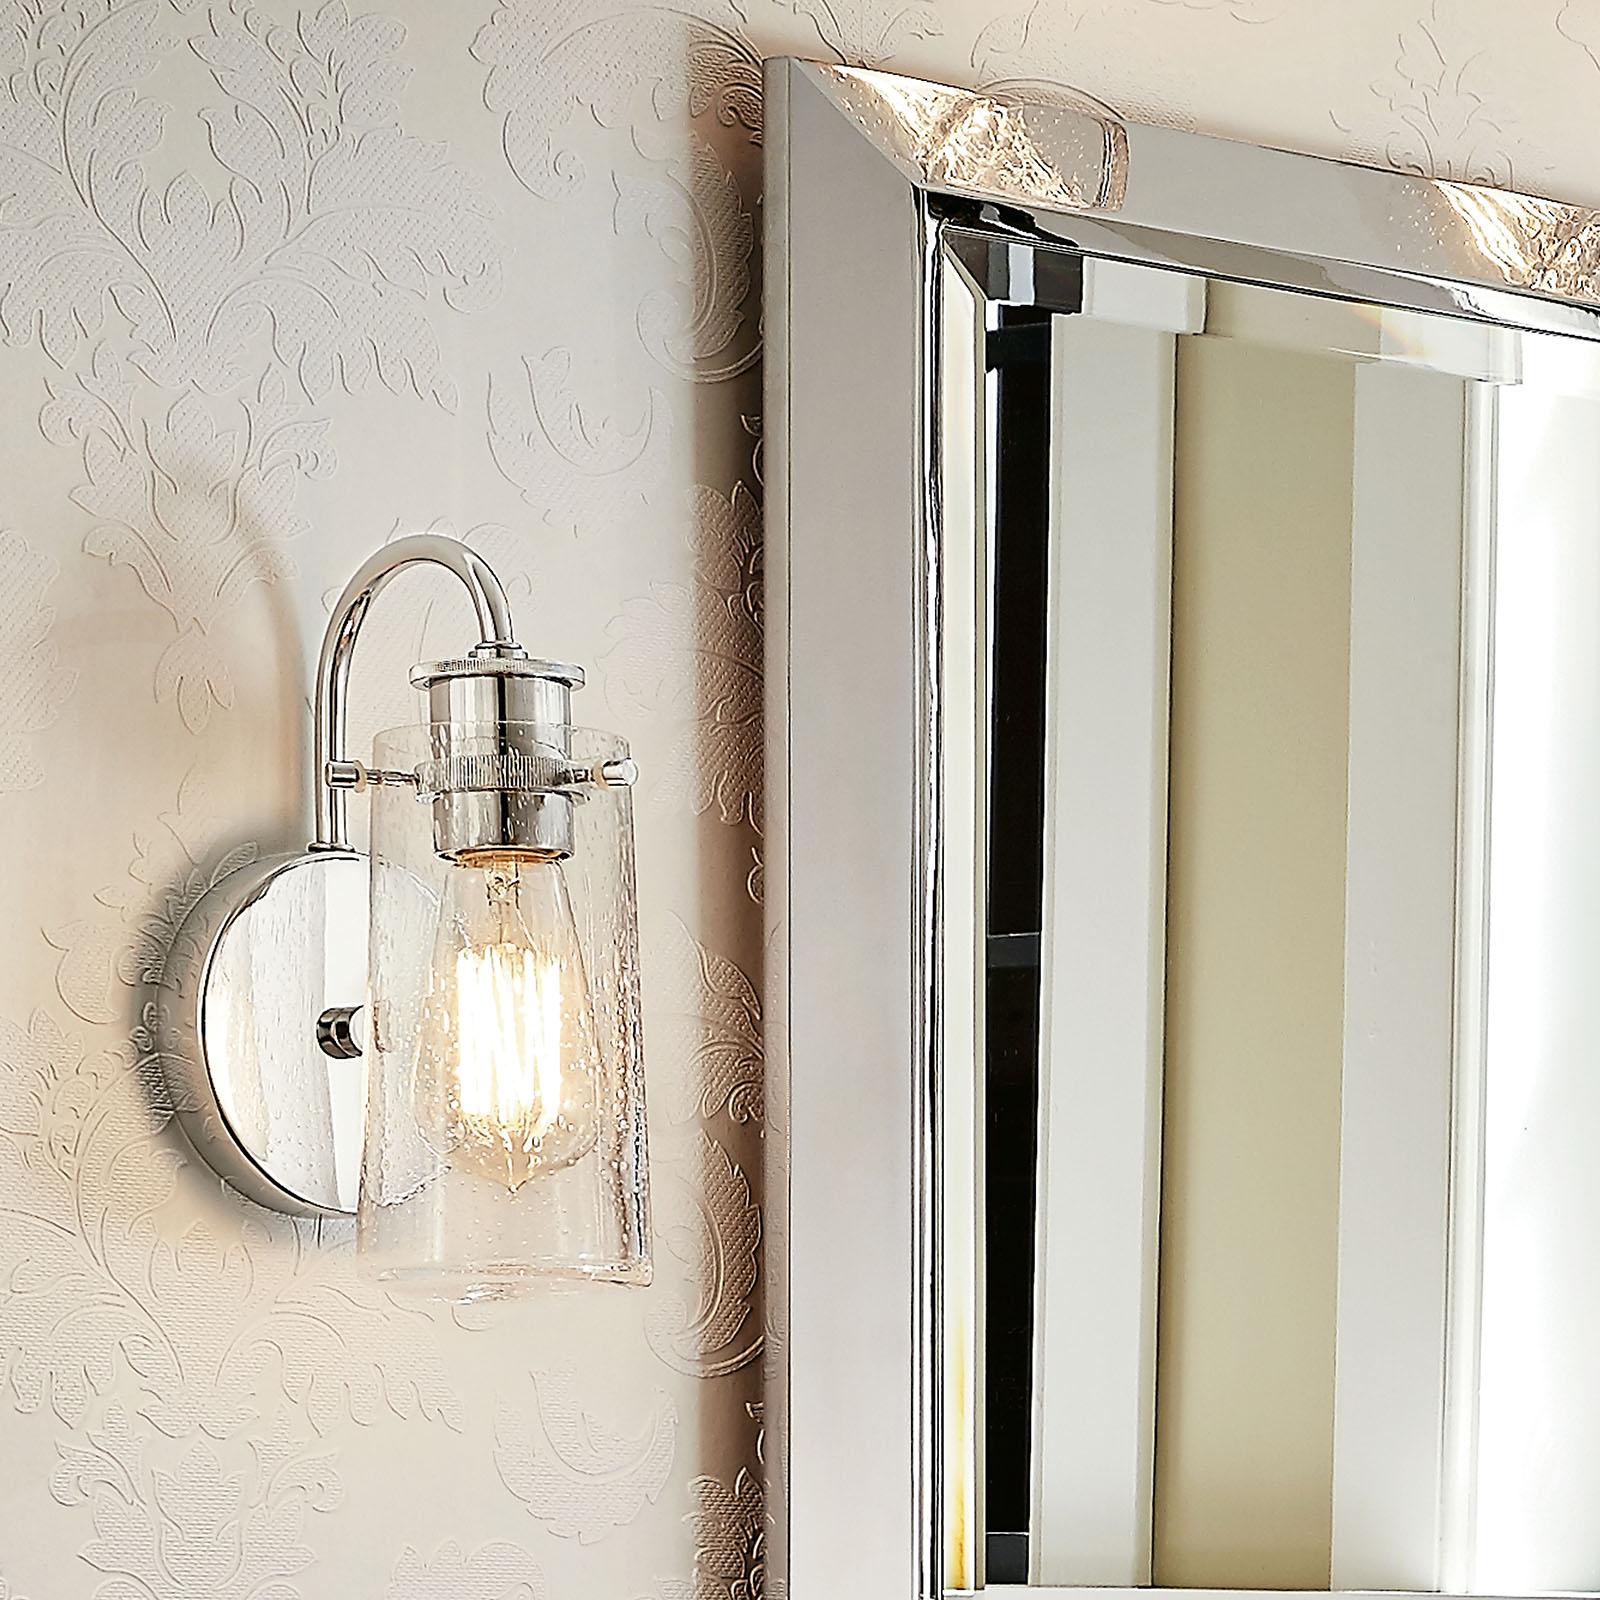 Braelyn 1 Light Wall Sconce Olde Bronze® | Kichler Lighting on Kichler Olde Bronze Wall Sconce id=85528